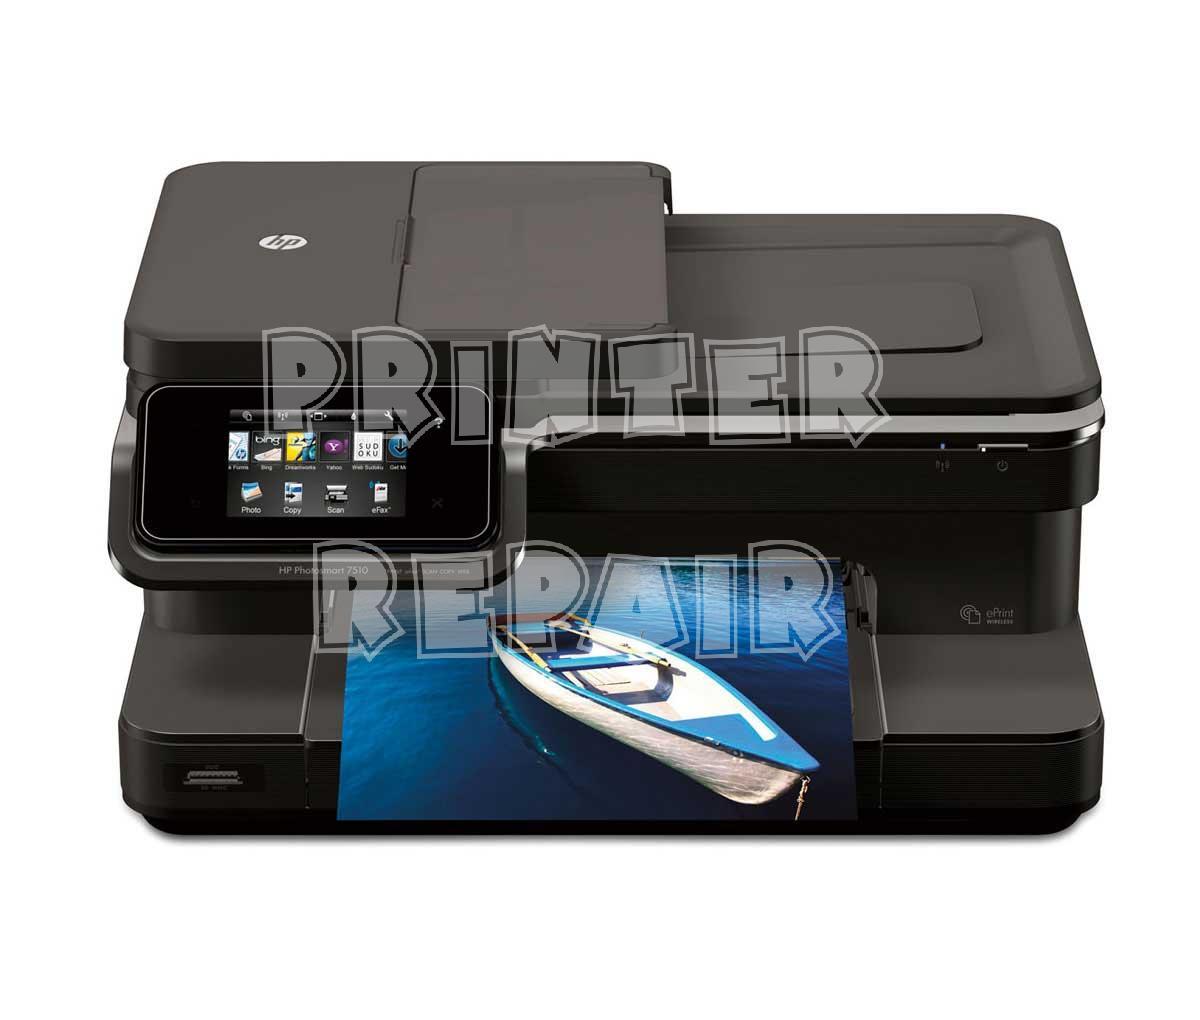 HP Photosmart 7515